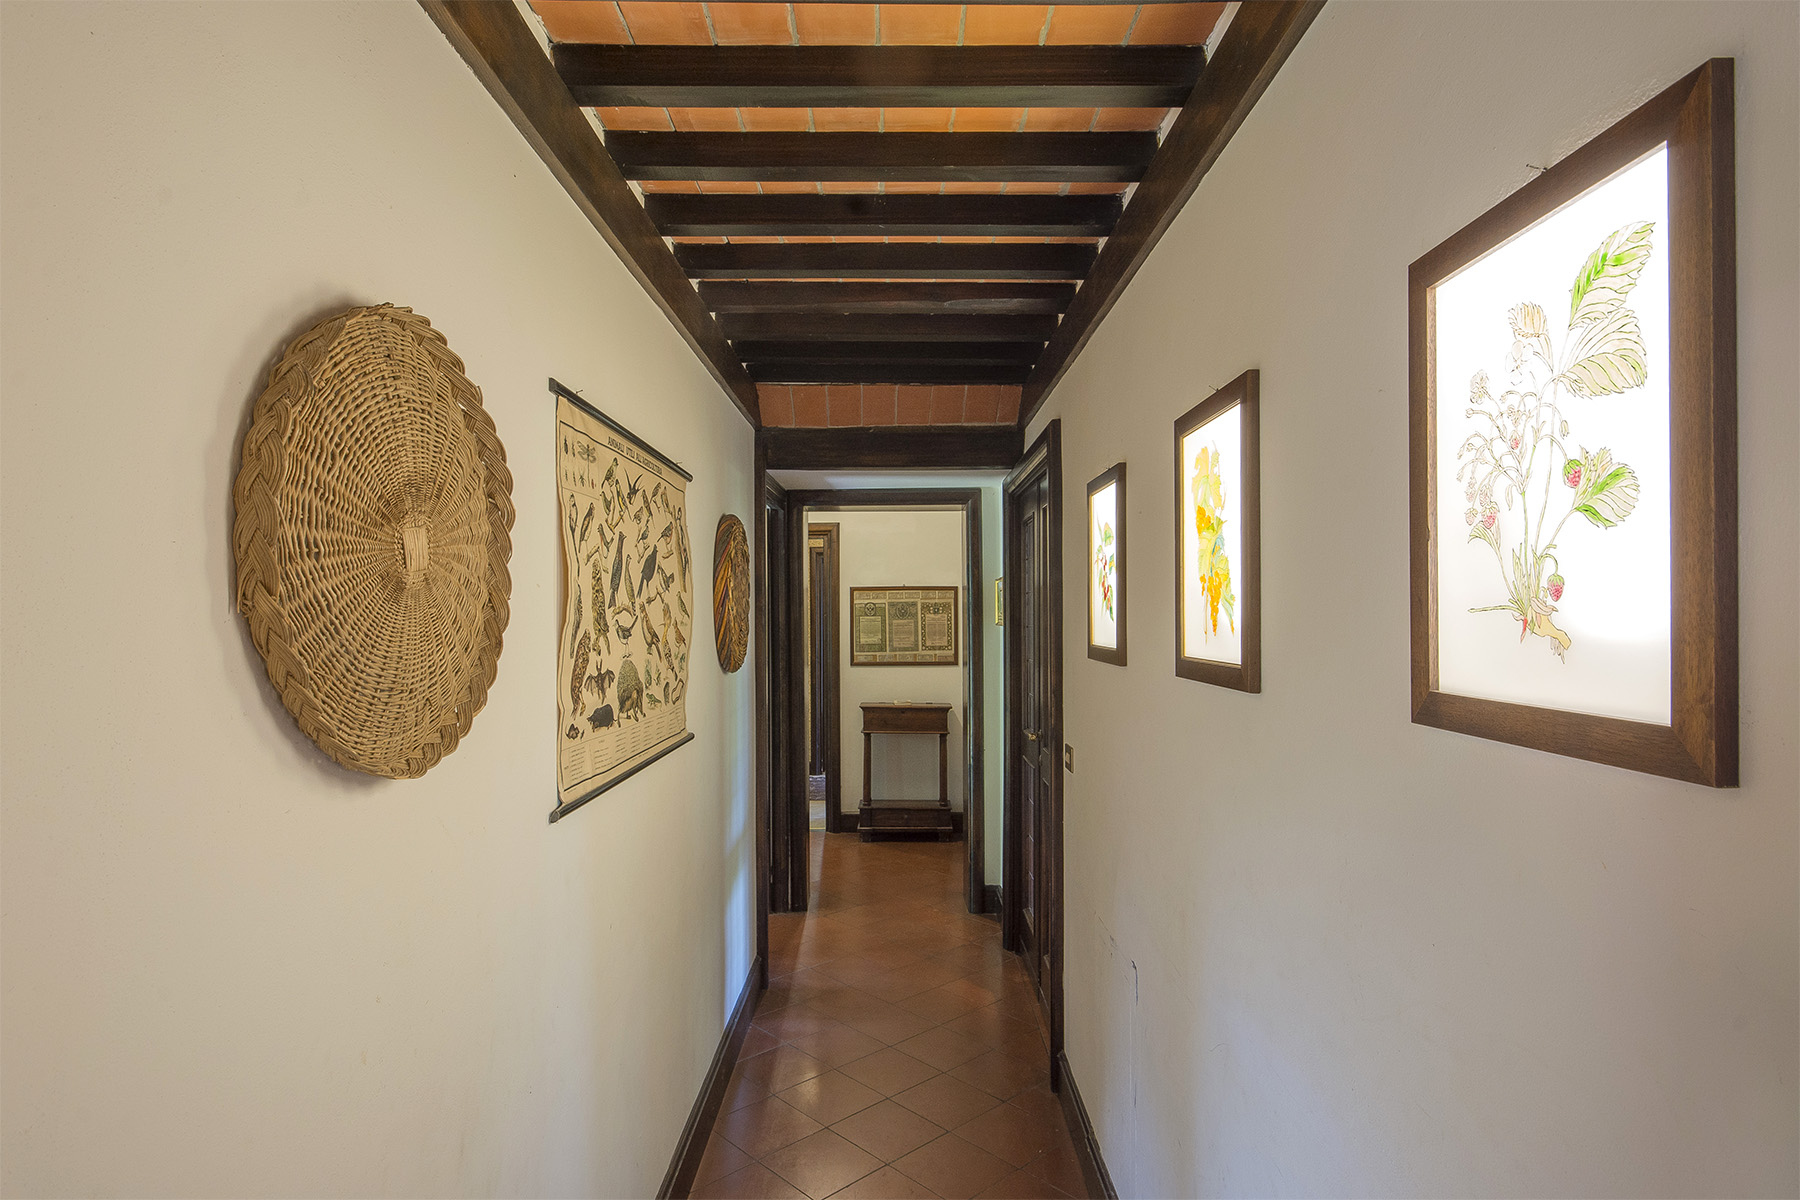 Villa in Vendita a Lucca: 5 locali, 600 mq - Foto 18